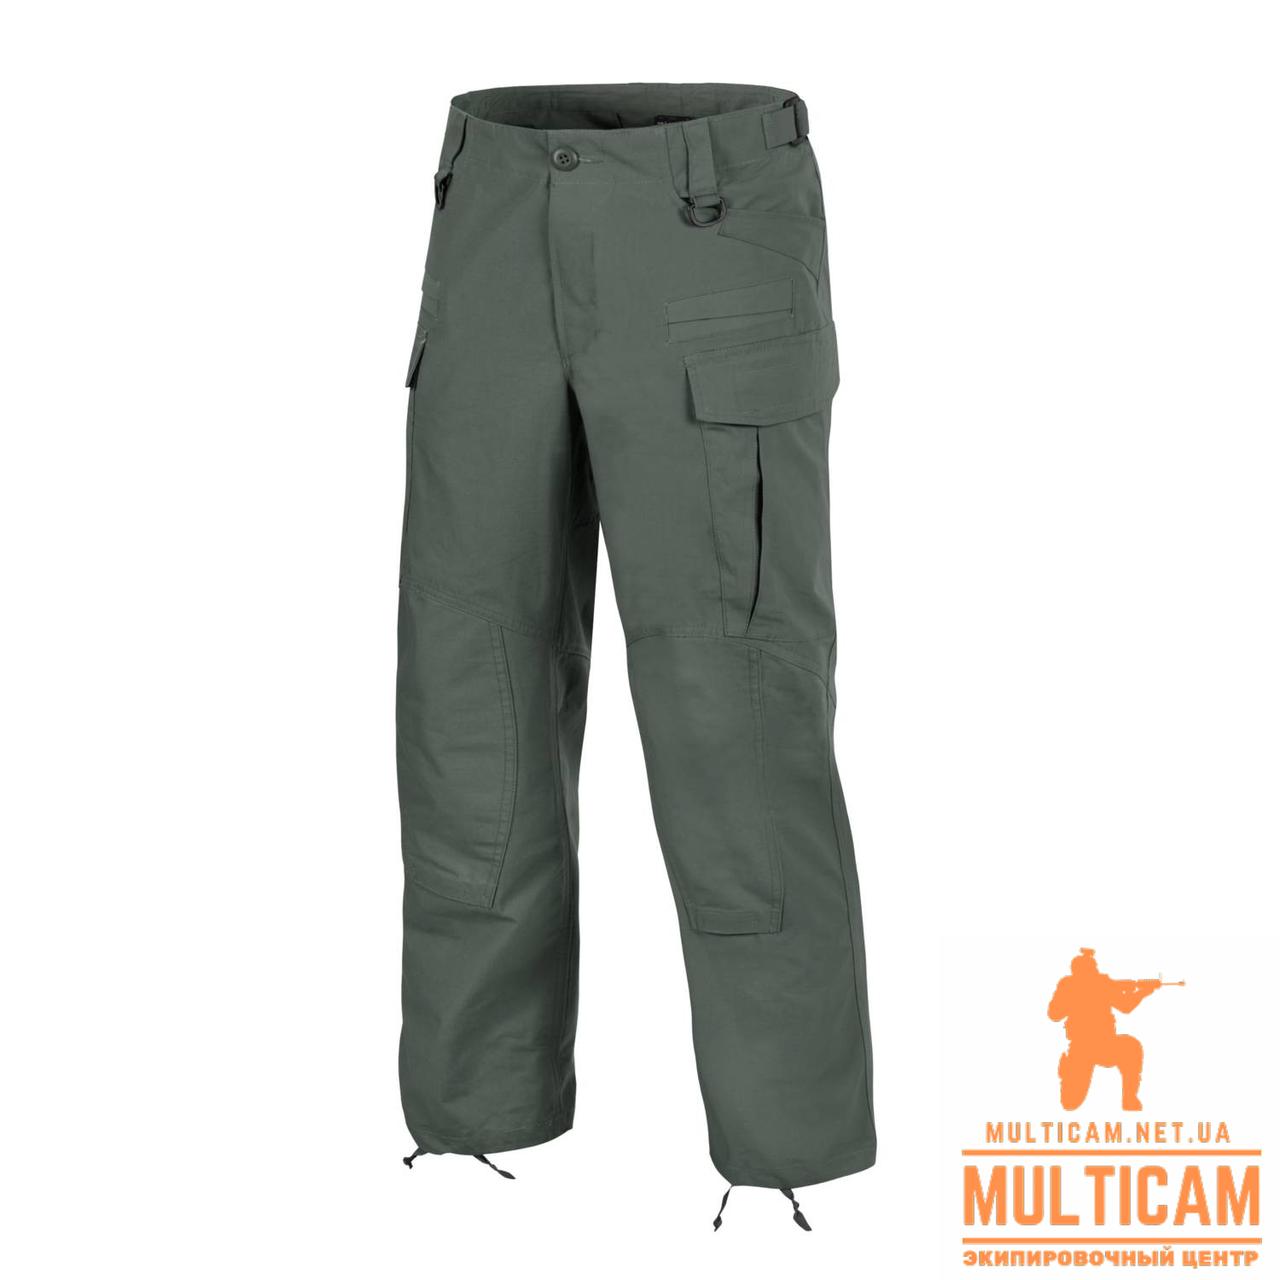 Брюки Helikon-Tex® SFU NEXT Pants® - PolyCotton Ripstop - Olive Green